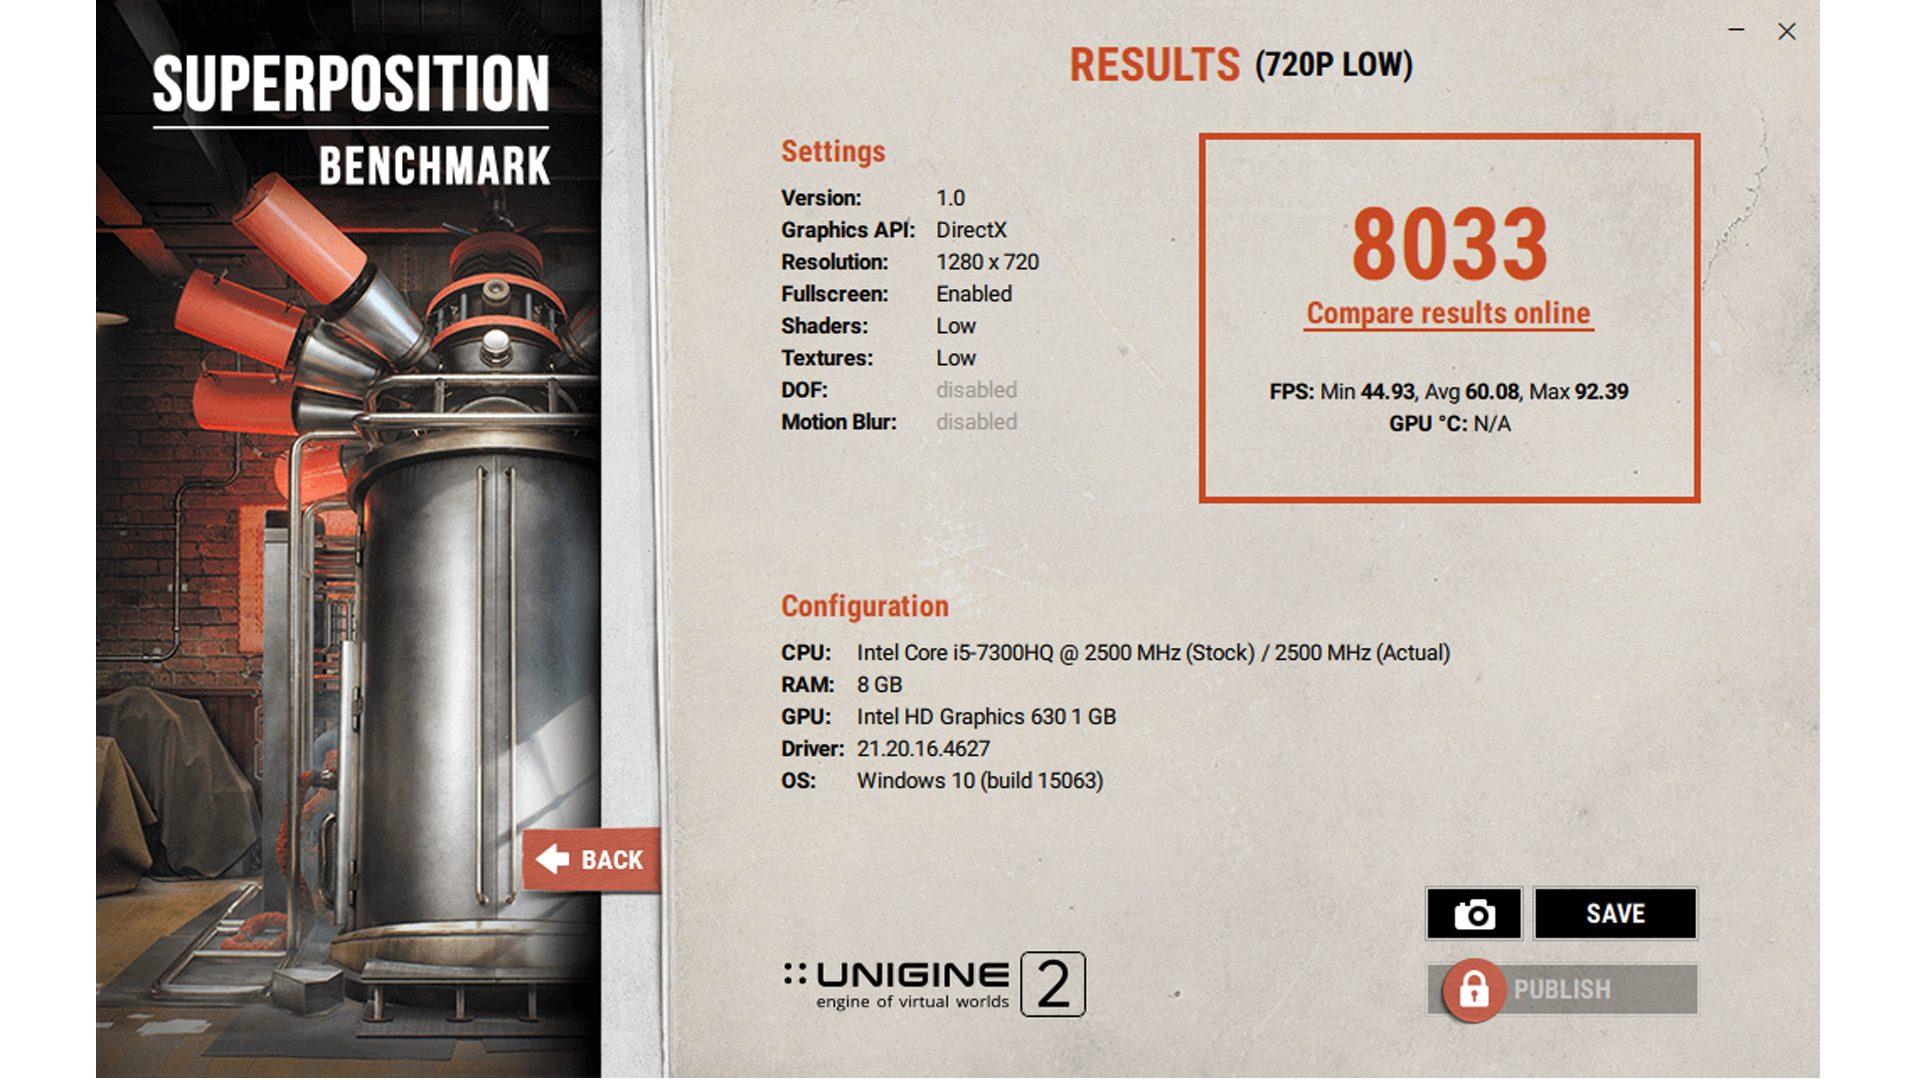 Lenovo-y520-15ikba-Benchmark_neu1